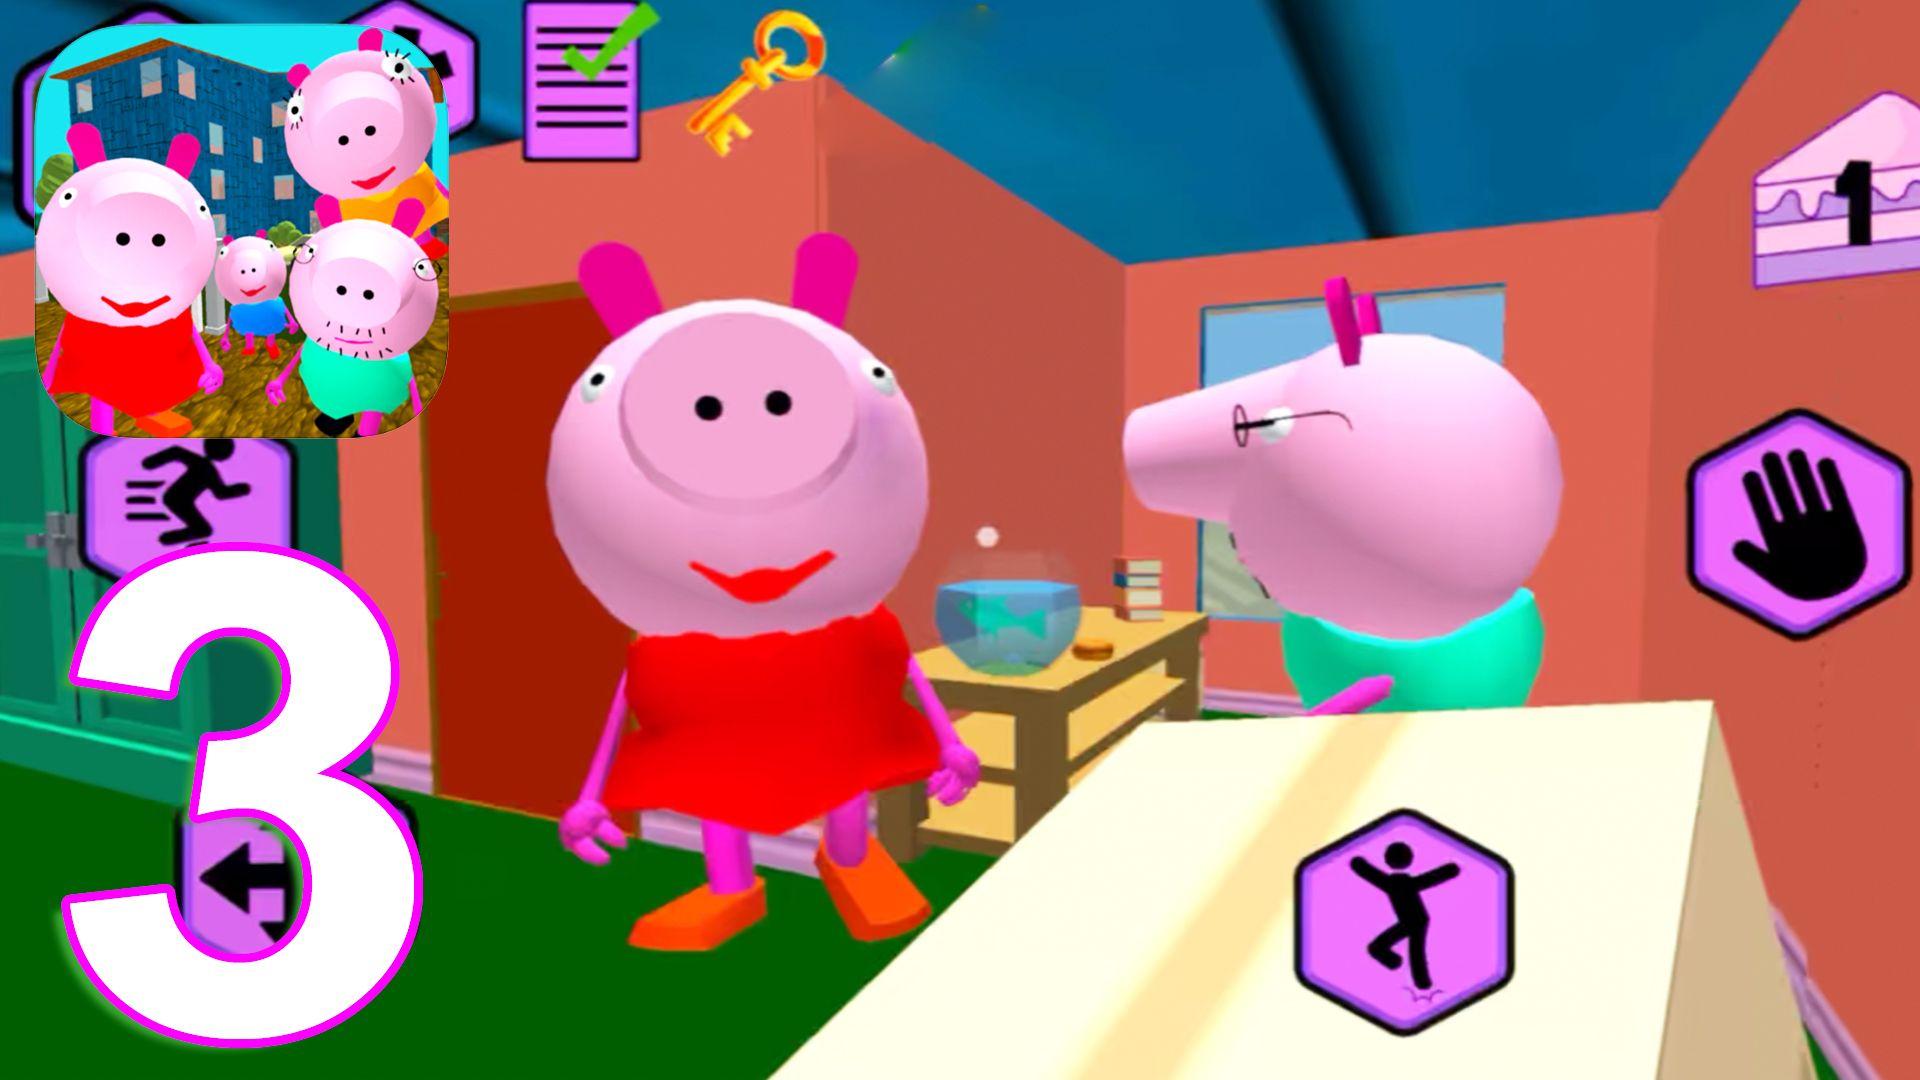 Piggy Neighbor Family Escape Obby House 3d Gameplay Walkthrough Part 3 Level 3 Ios Android Piggy Gameplay Family